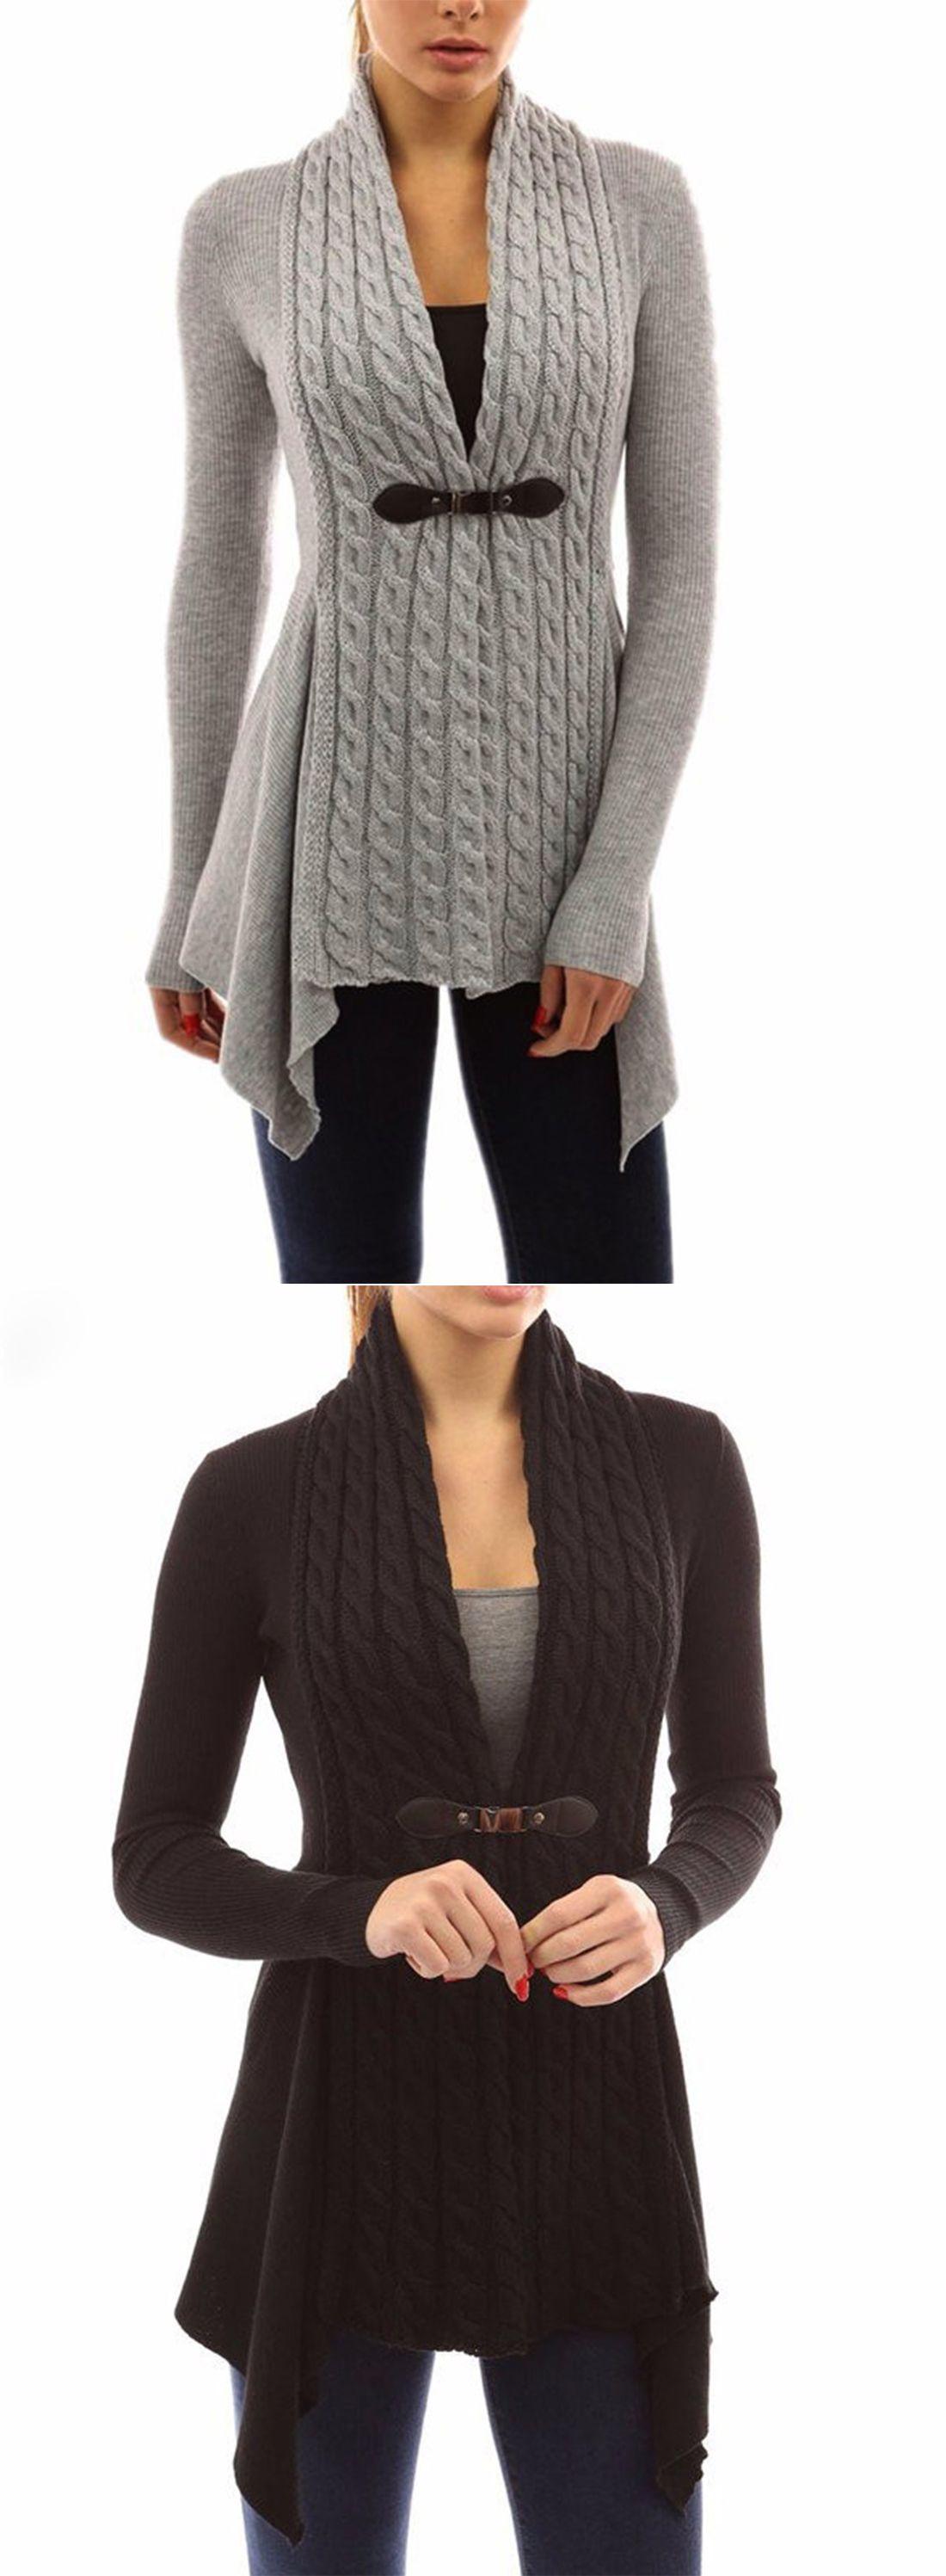 c4ec28b2b0d  26.35 Fashion Long Sleeve Irregular Slim Fit Cardigan